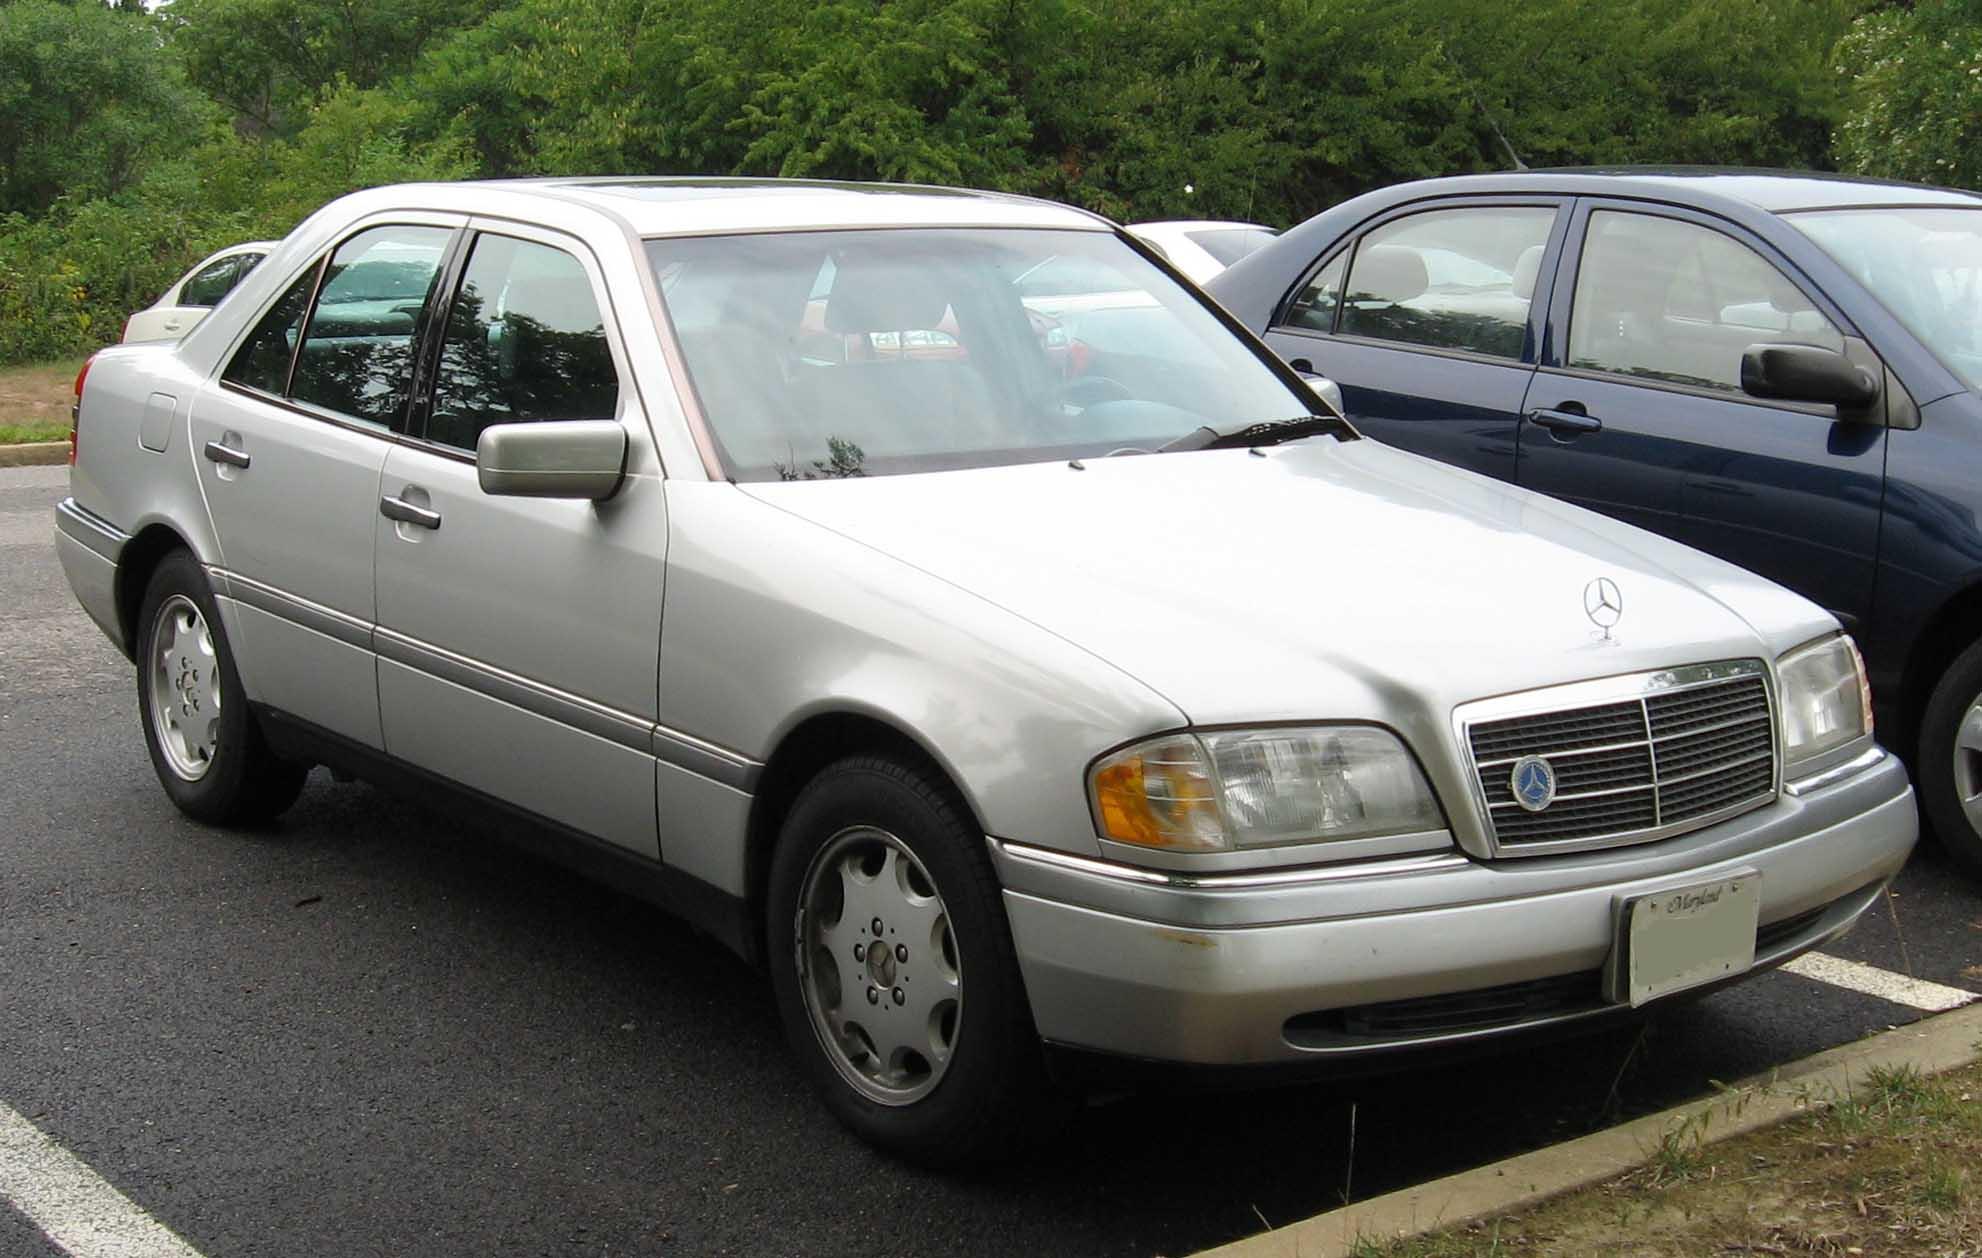 Mercedes-Benz C-klasse I (W202) 1993 - 1997 Sedan #1